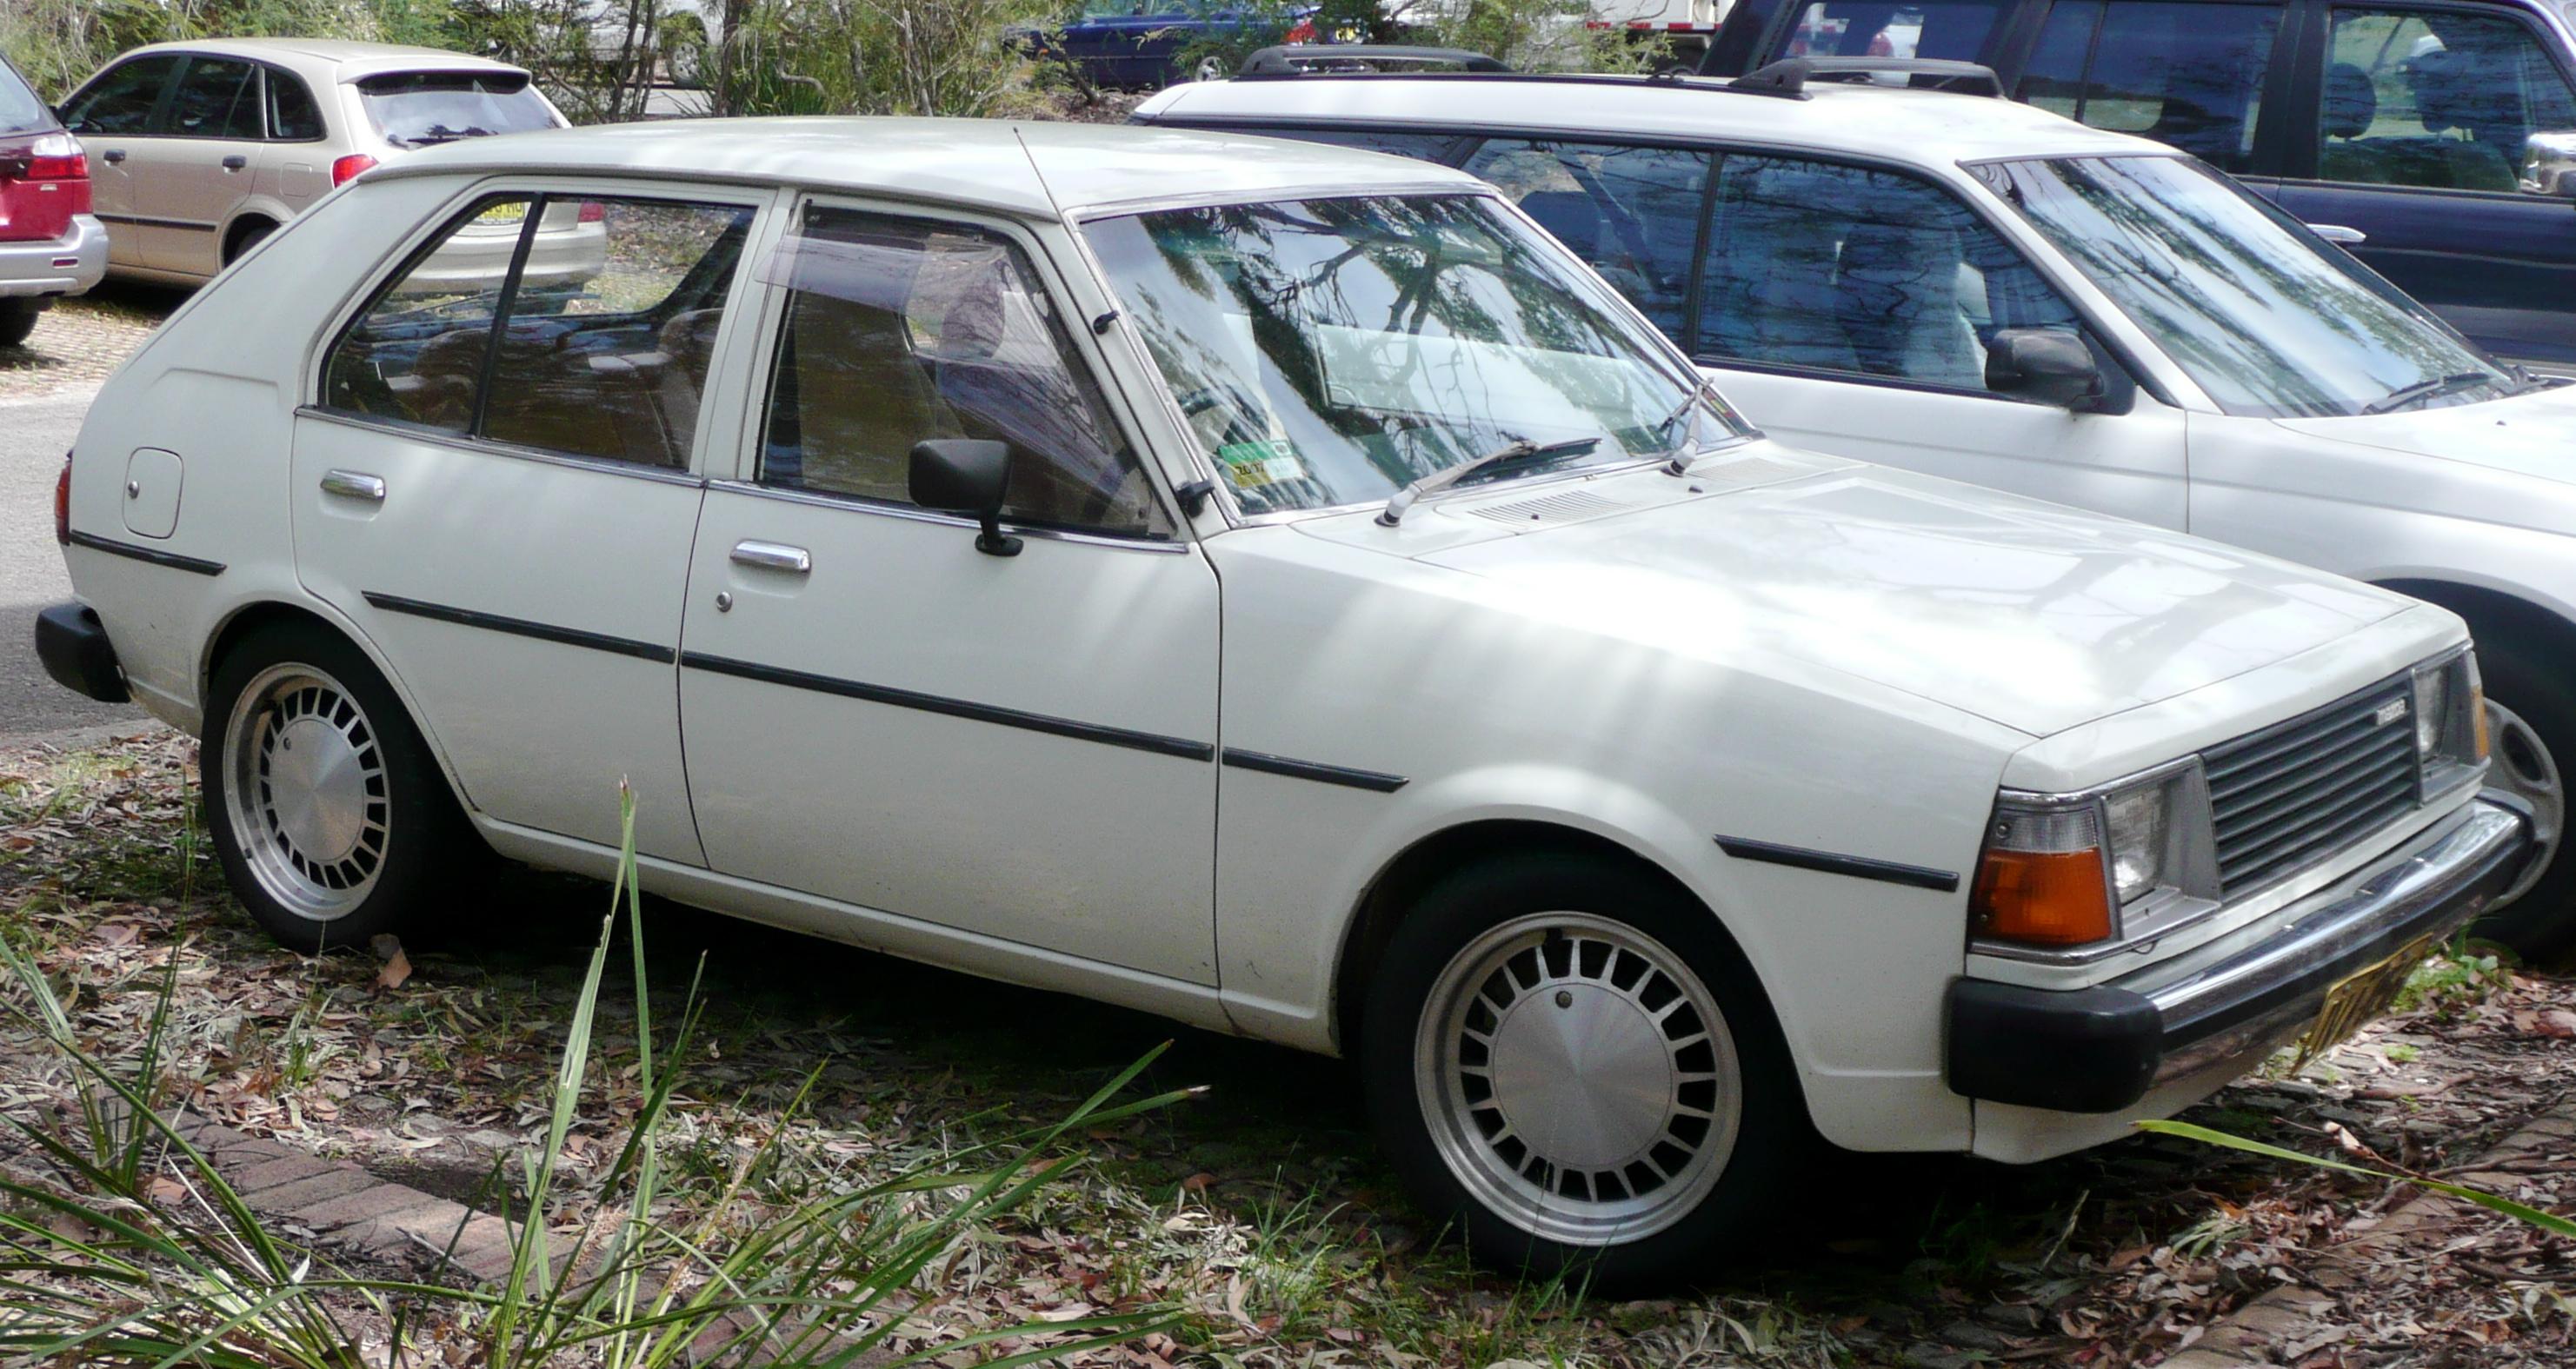 file:1979-1980 mazda 323 1.4 hatchback 03 - wikimedia commons